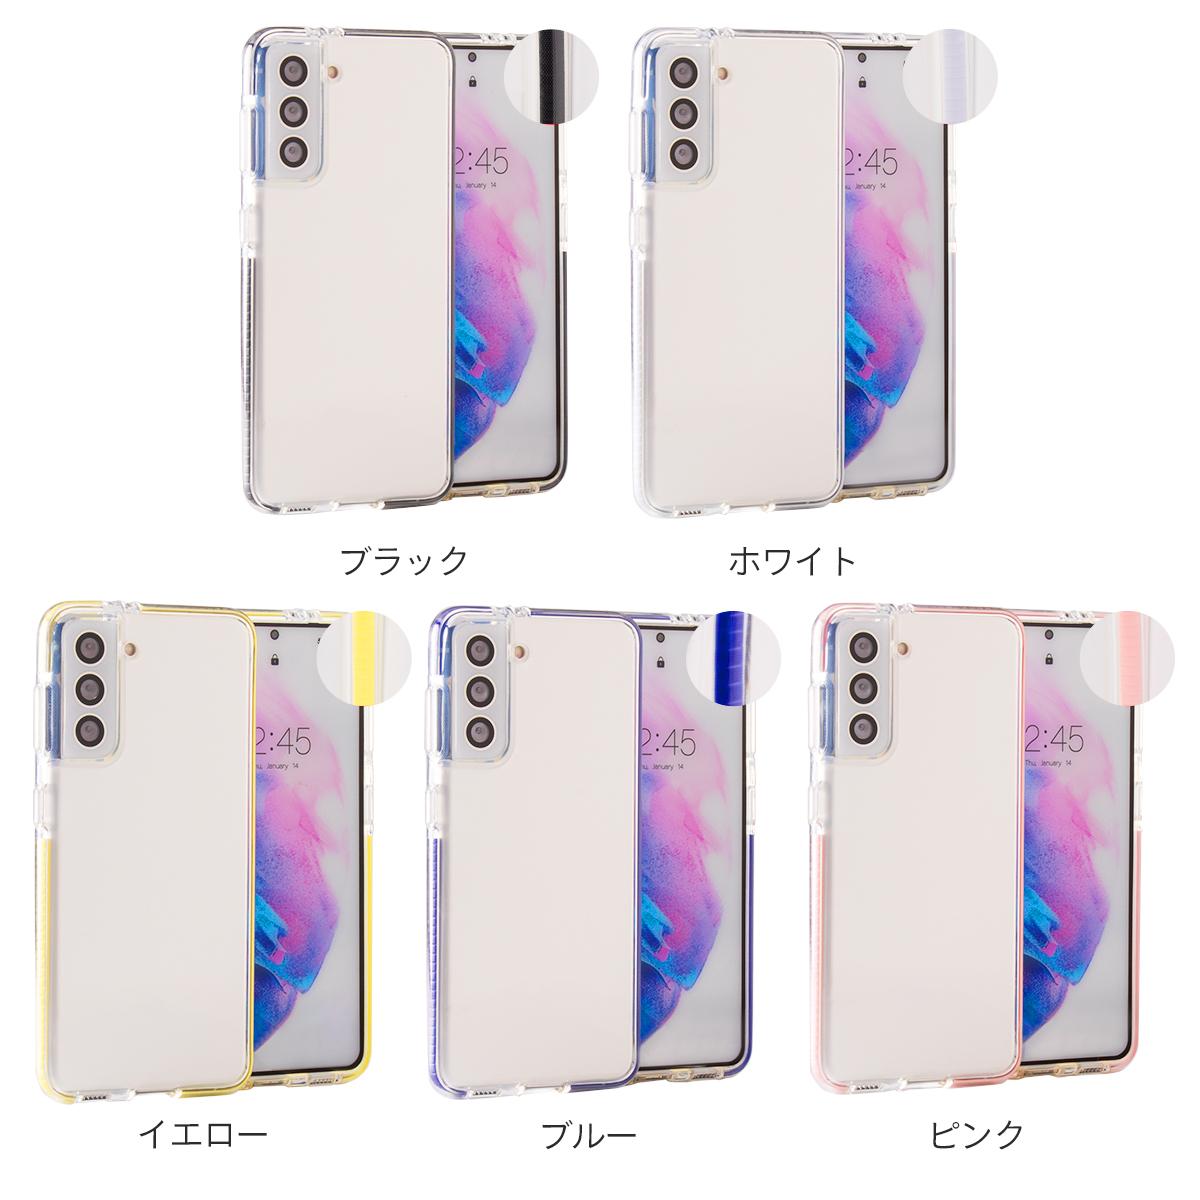 Galaxy S21 5G Galaxy S21+ 5G Galaxy S21 Ultra 耐衝撃 グラデーションTPU クリアケース